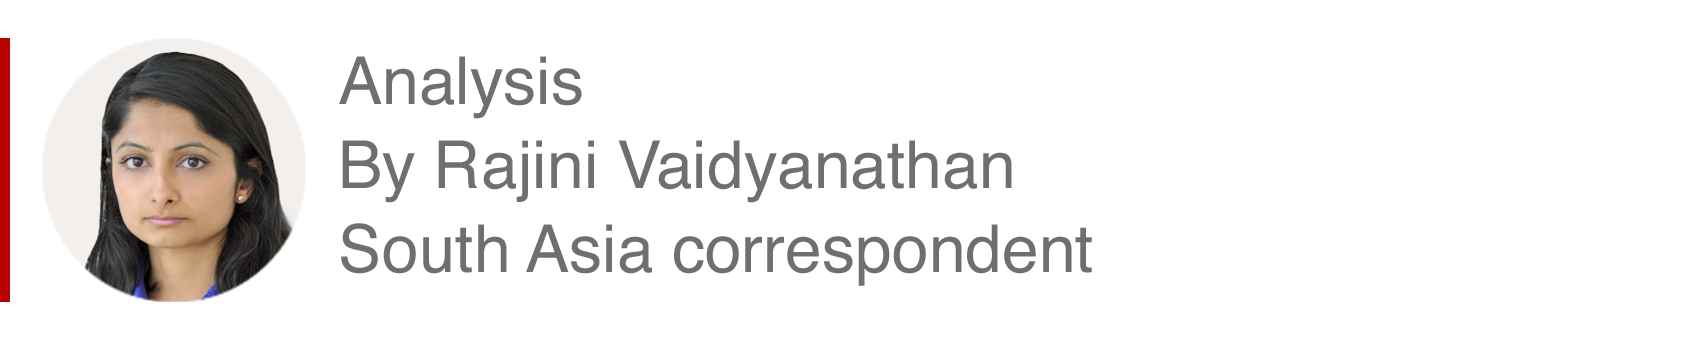 Analysis box by Rajini Vaidyanathan, South Asia correspondent